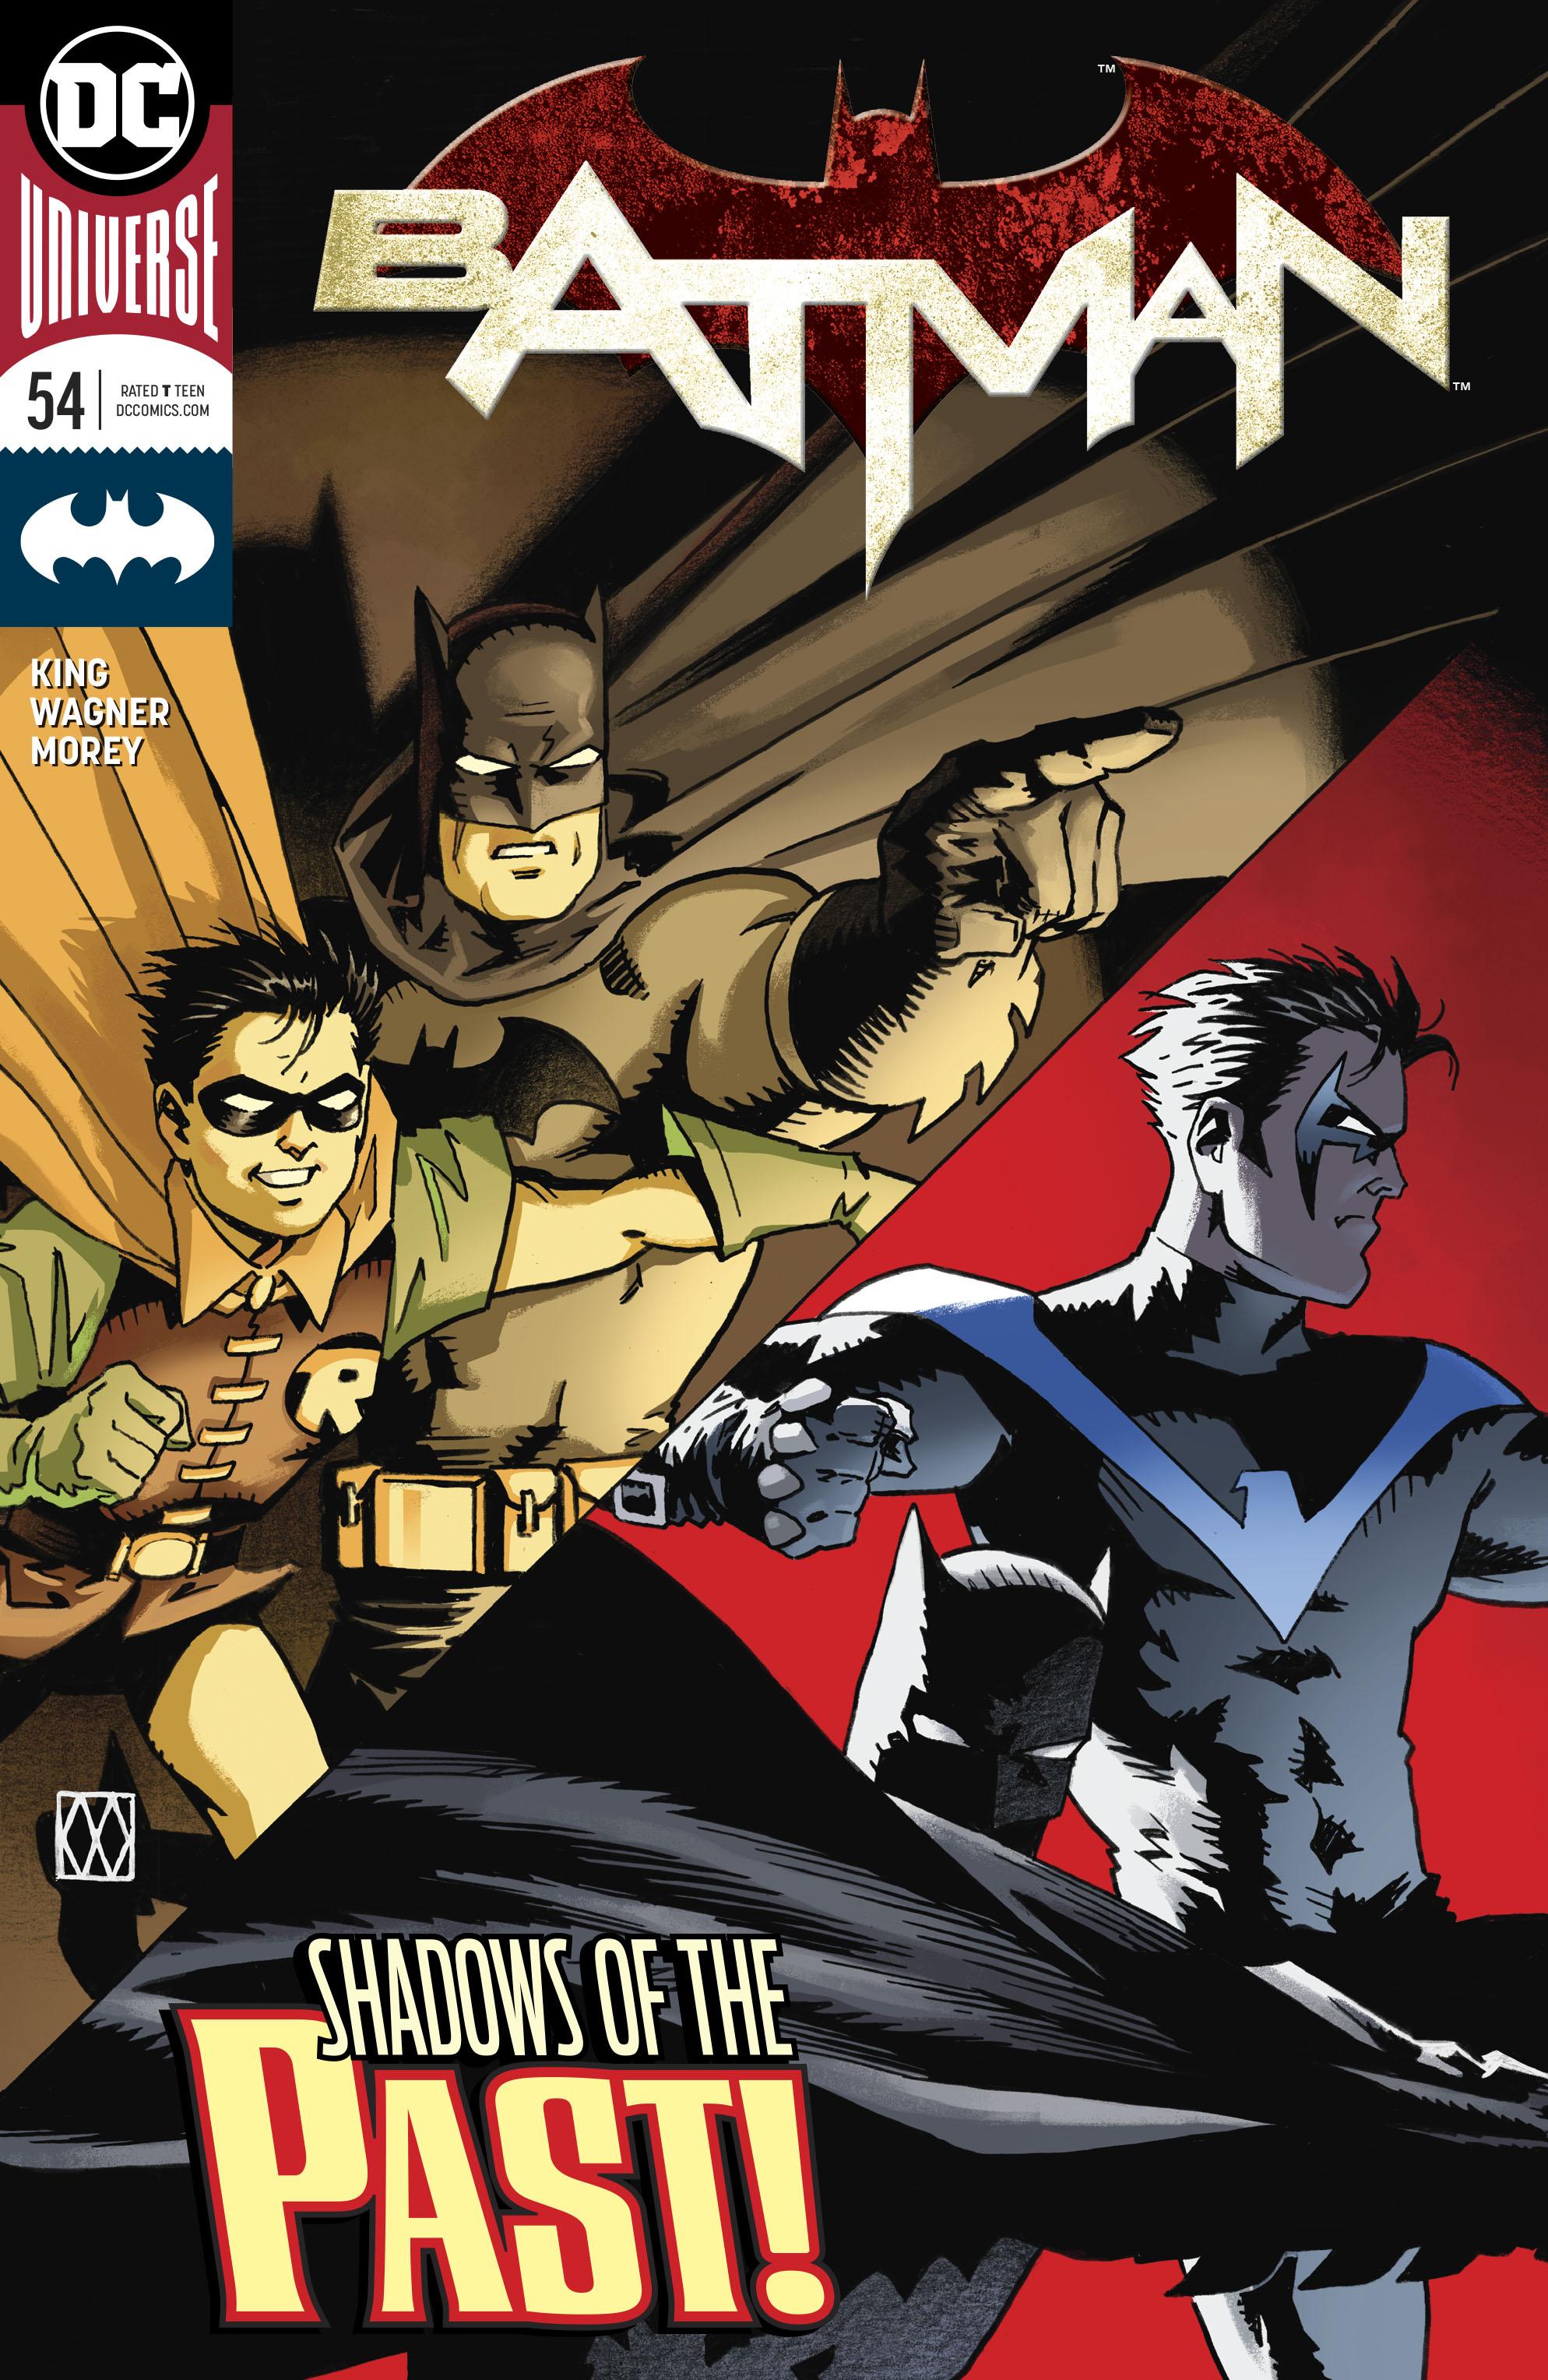 Batman # 54 review